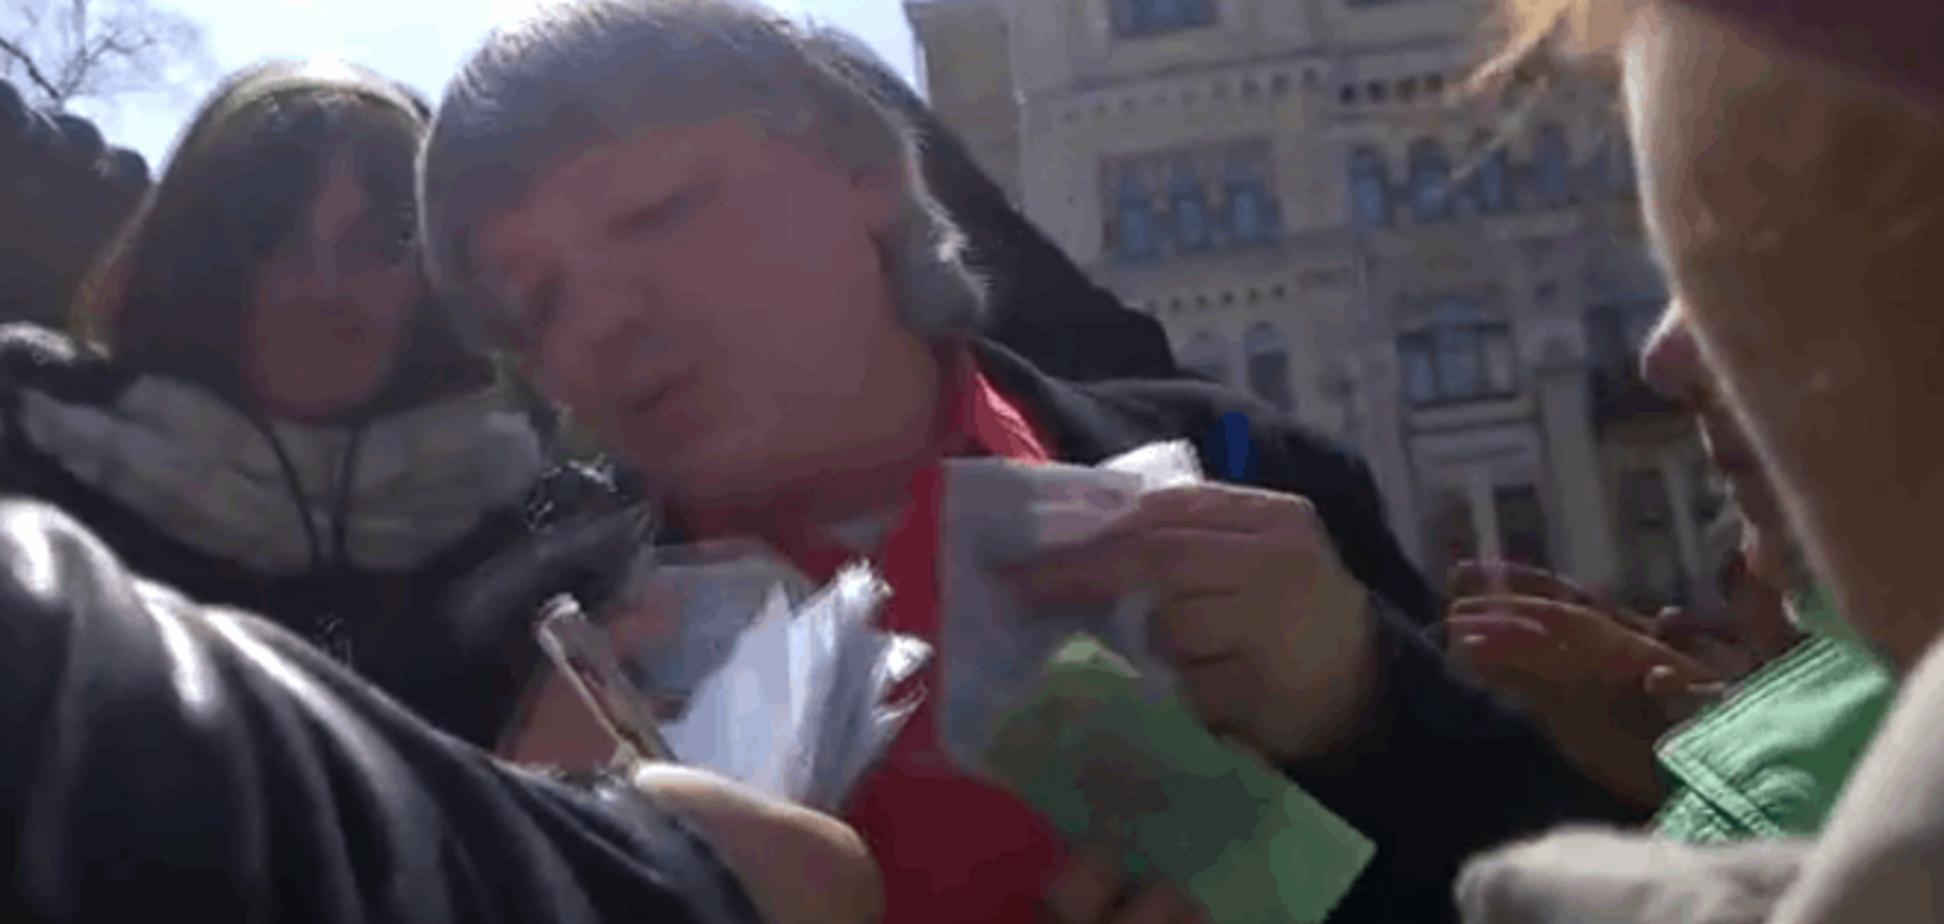 Как 'шахтерам' после митинга раздавали деньги: видеофакт